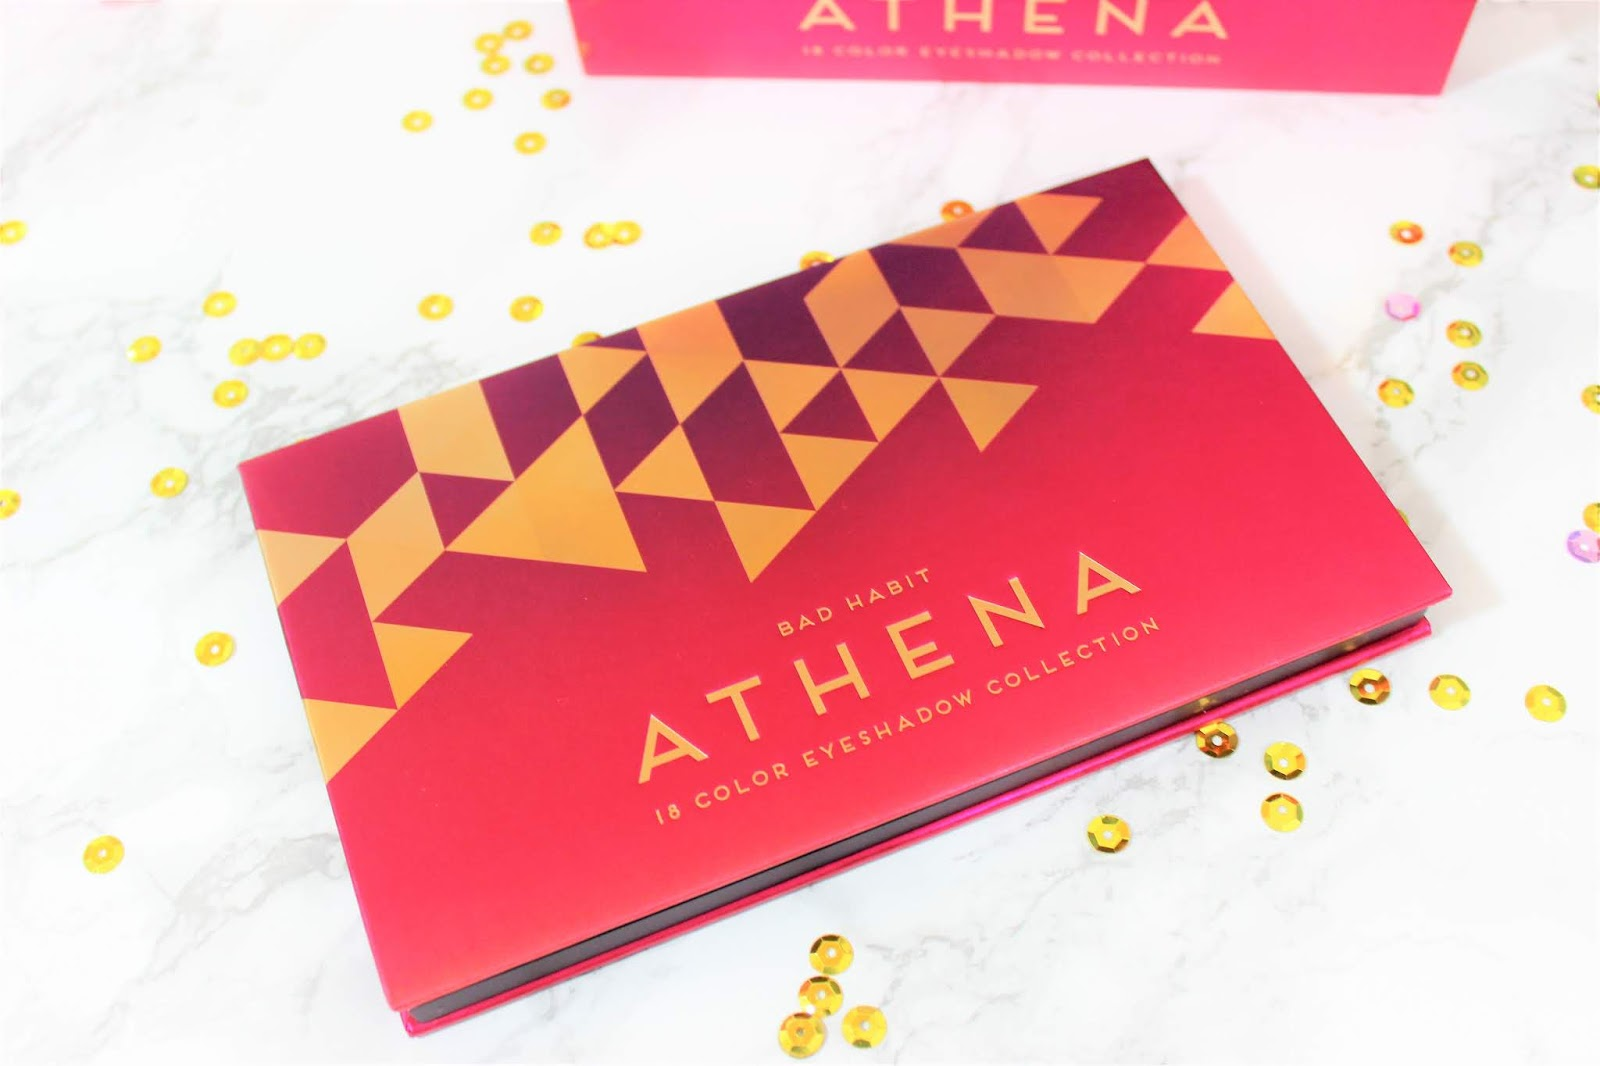 Bad Habit Athena Palette